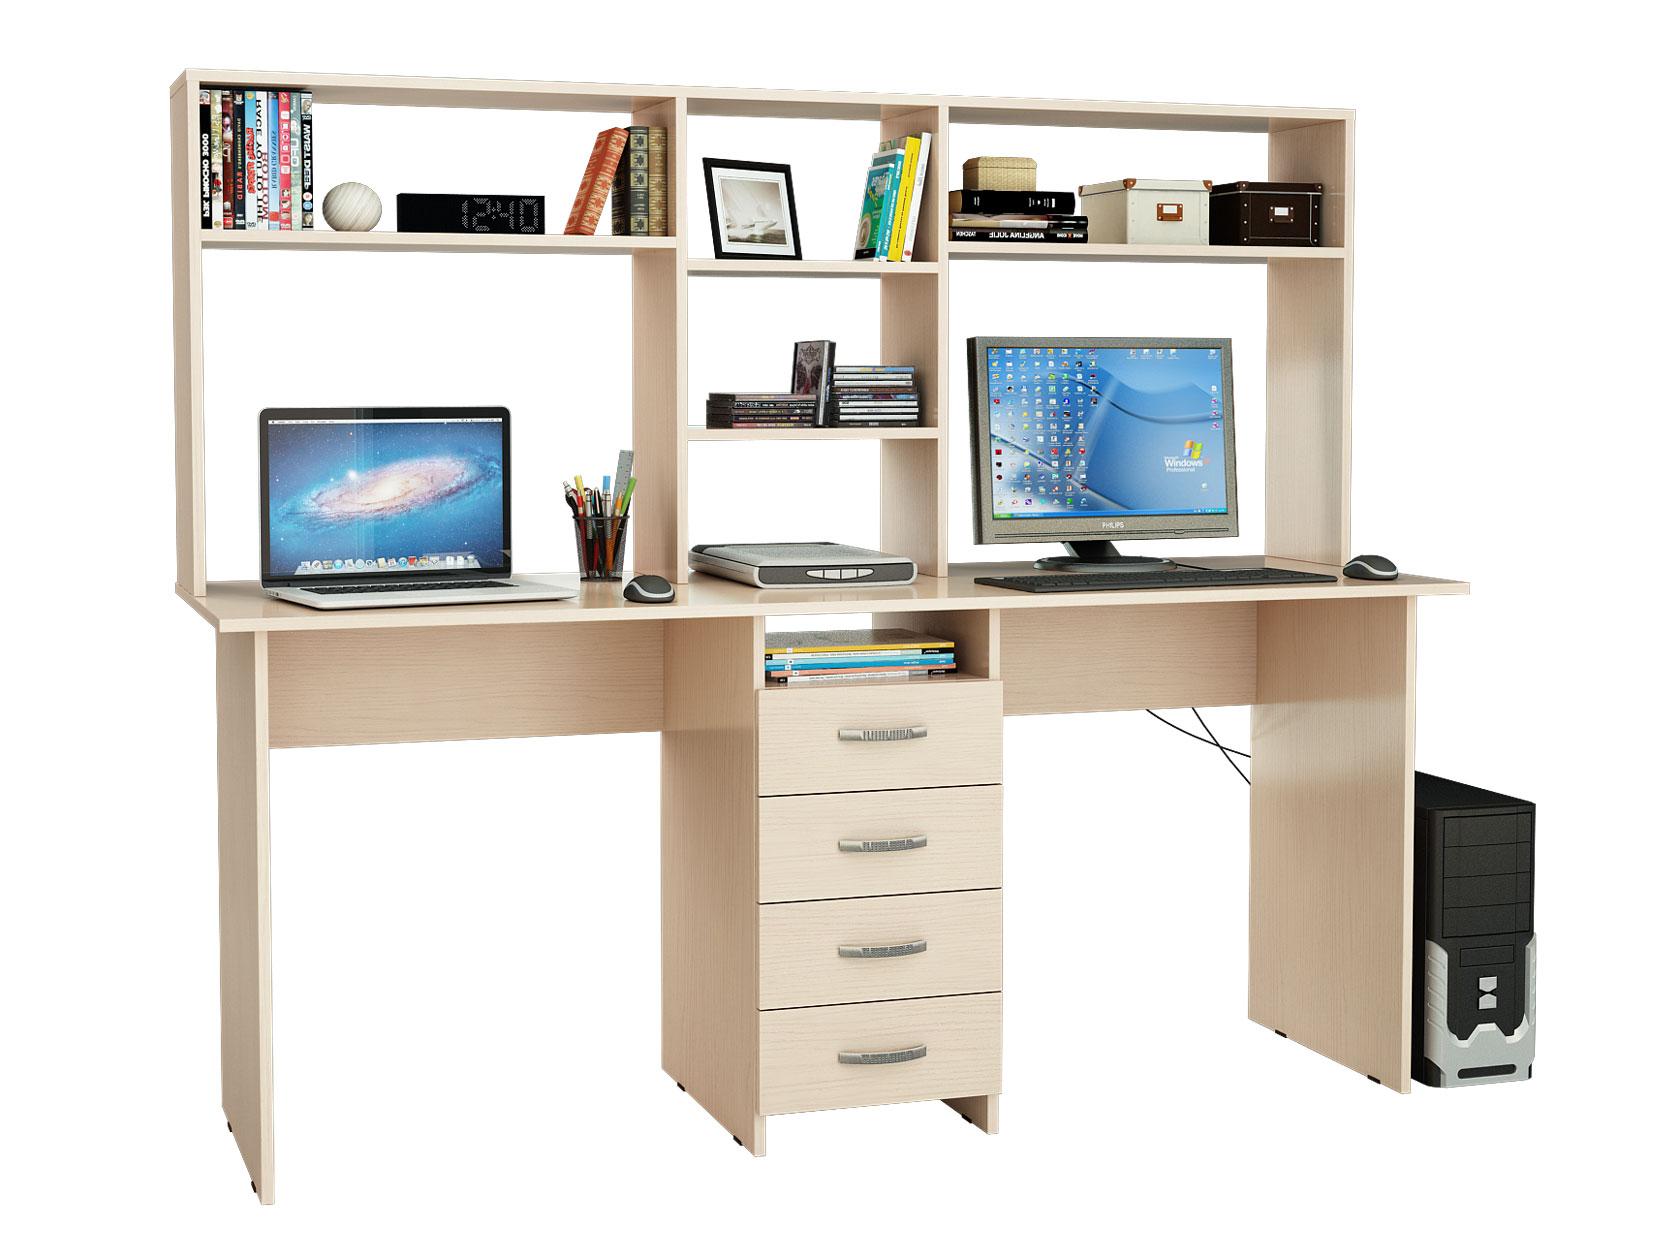 Компьютерный стол МФ Мастер Тандем-2 174,8x60x141,8, дуб молочный